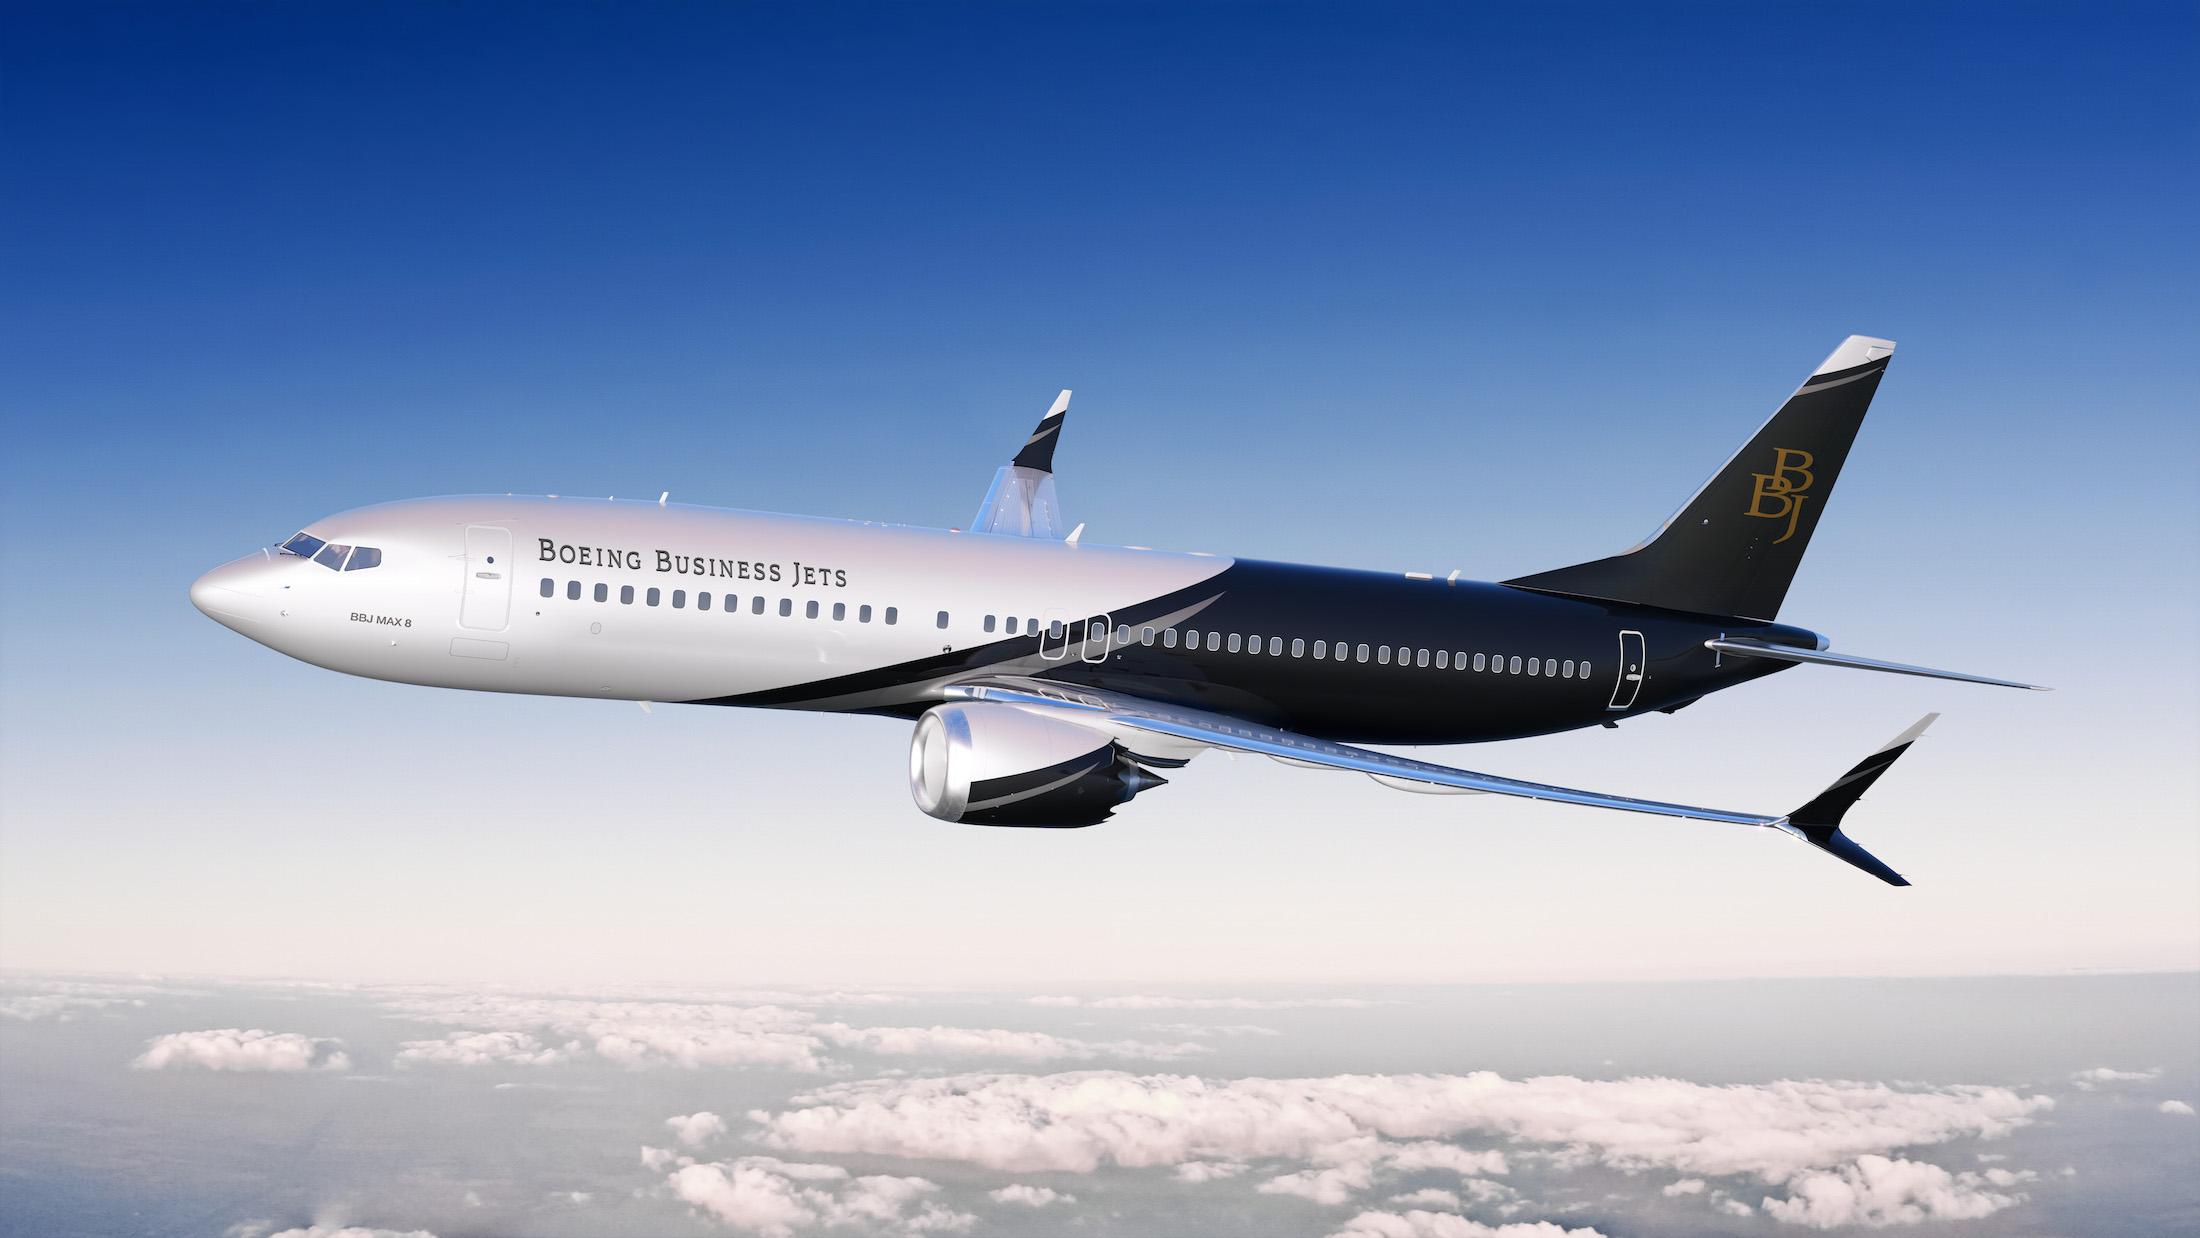 4 - Boeing Business Jet